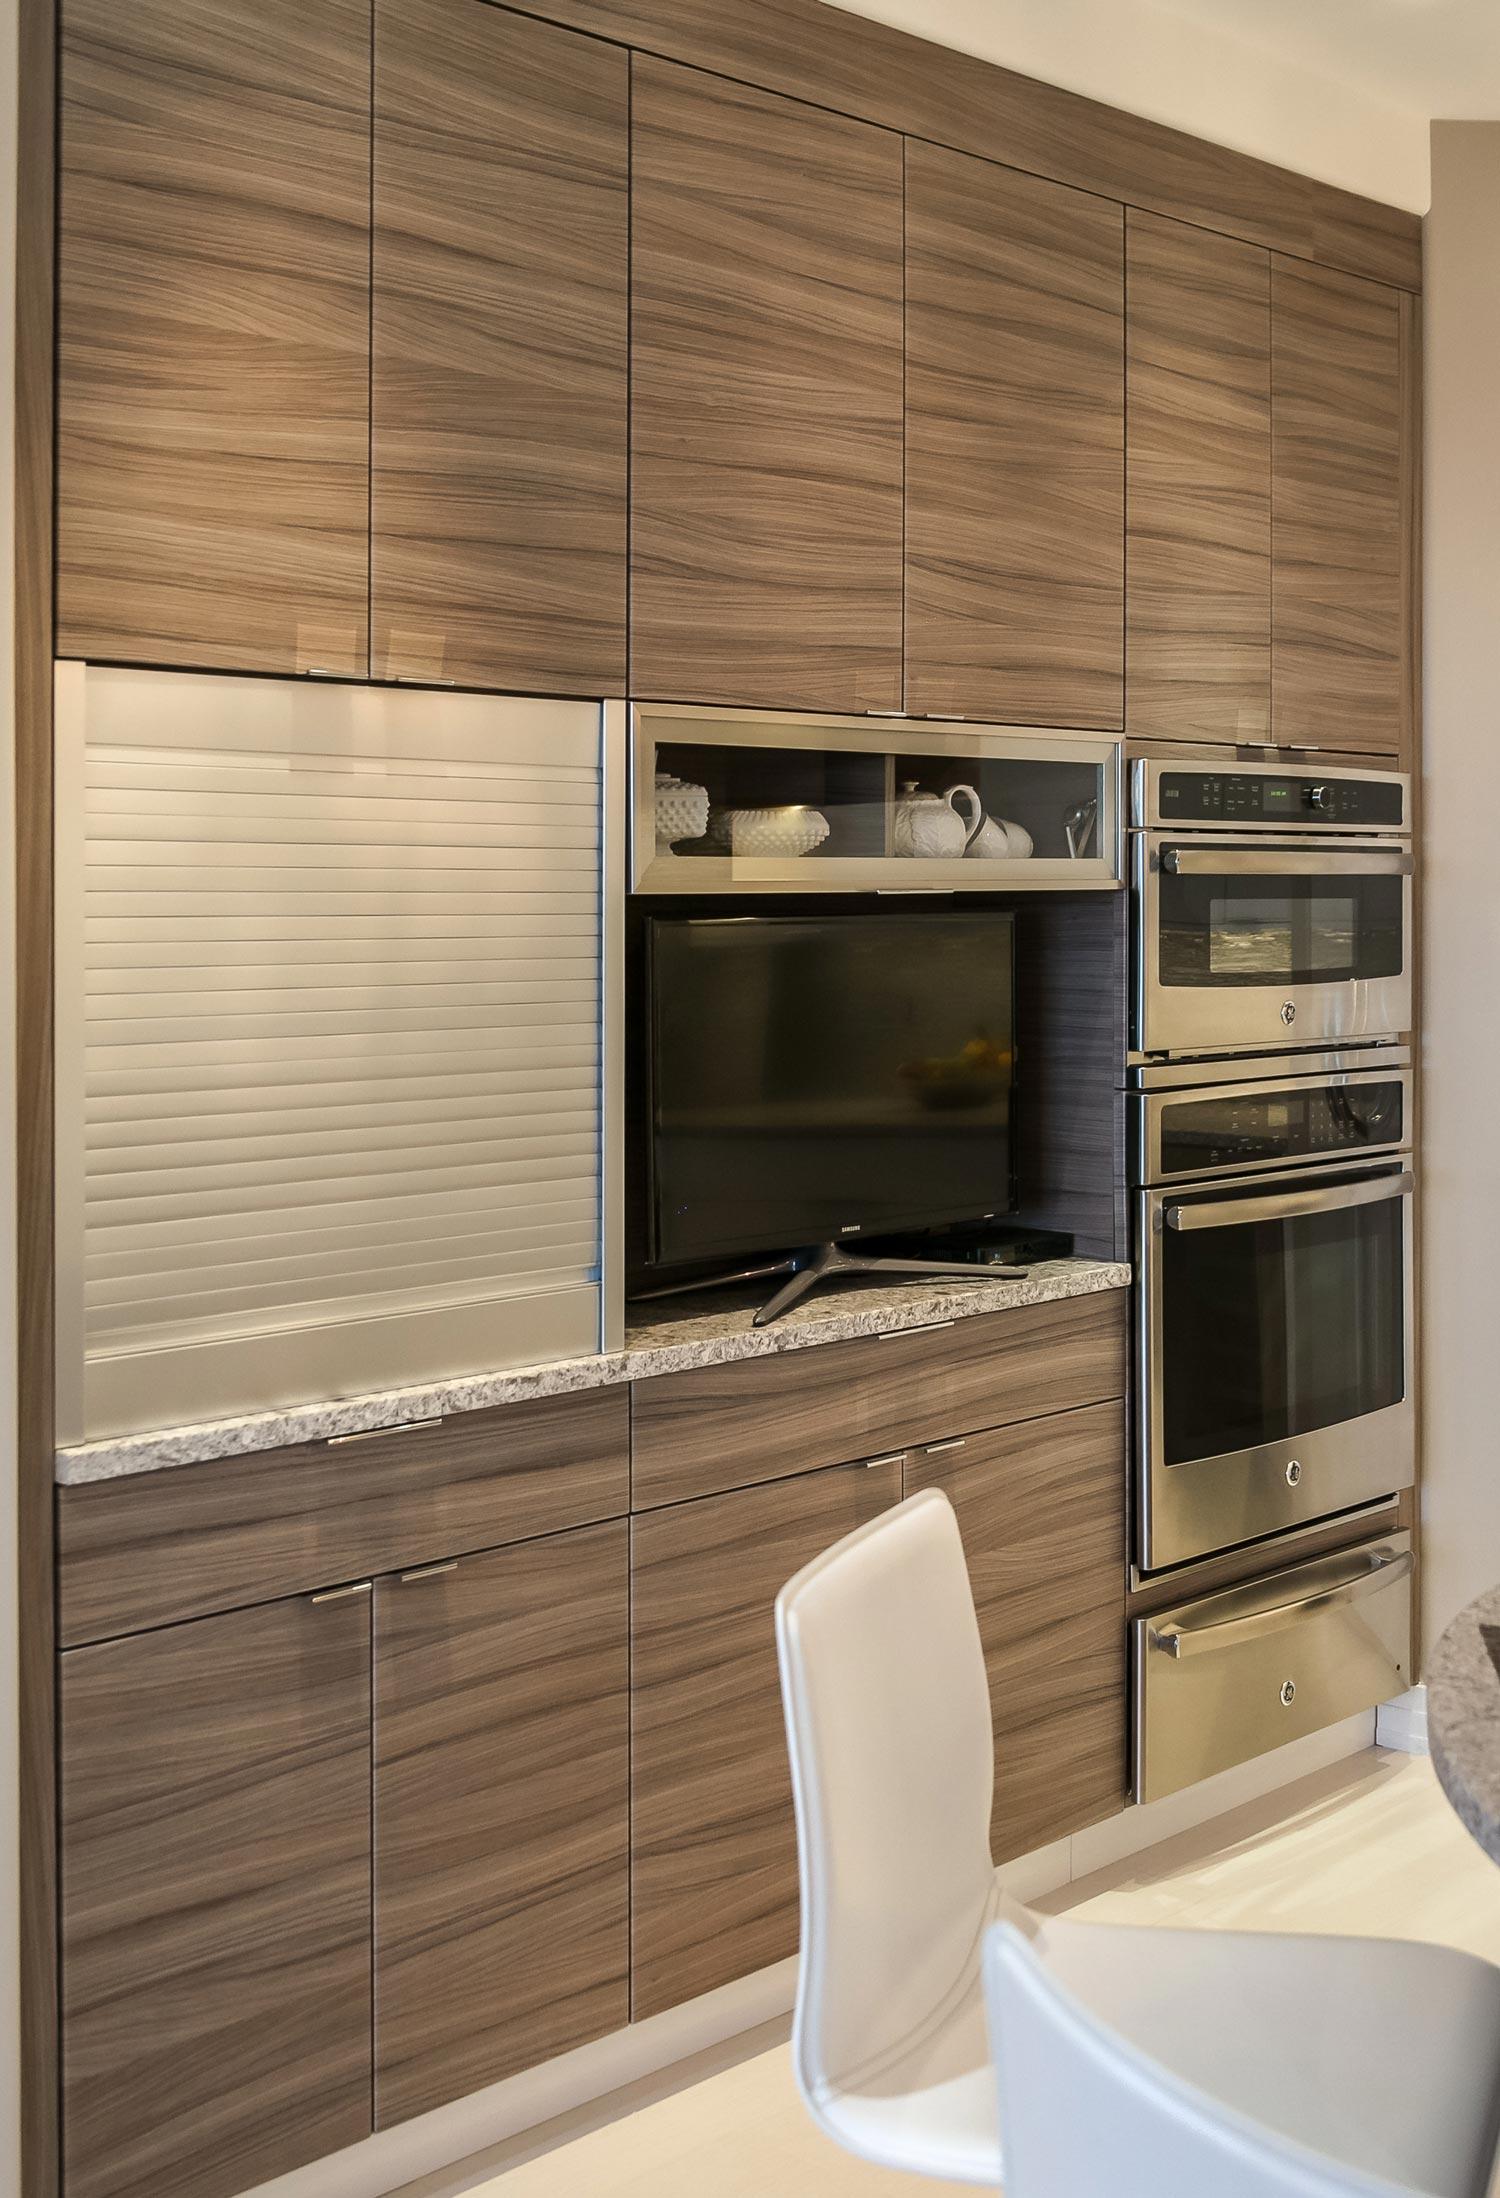 contemporary denver kitchen features white glass cabinets kitchen remodel denver sleek contemporary kitchen renovation denver colorado